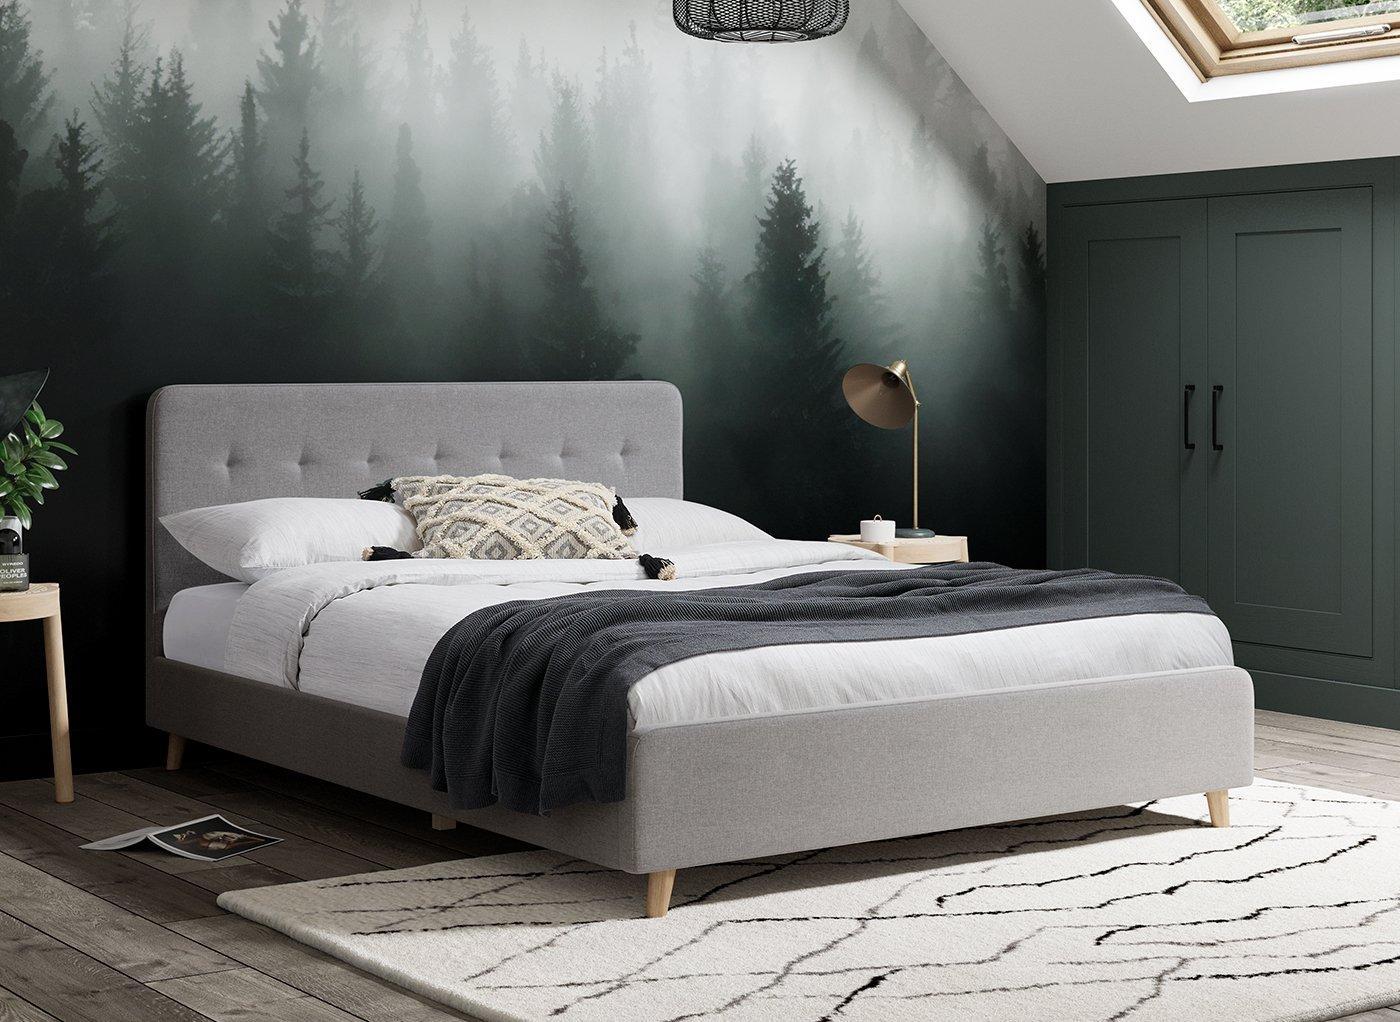 emerson-upholstered-bed-frame